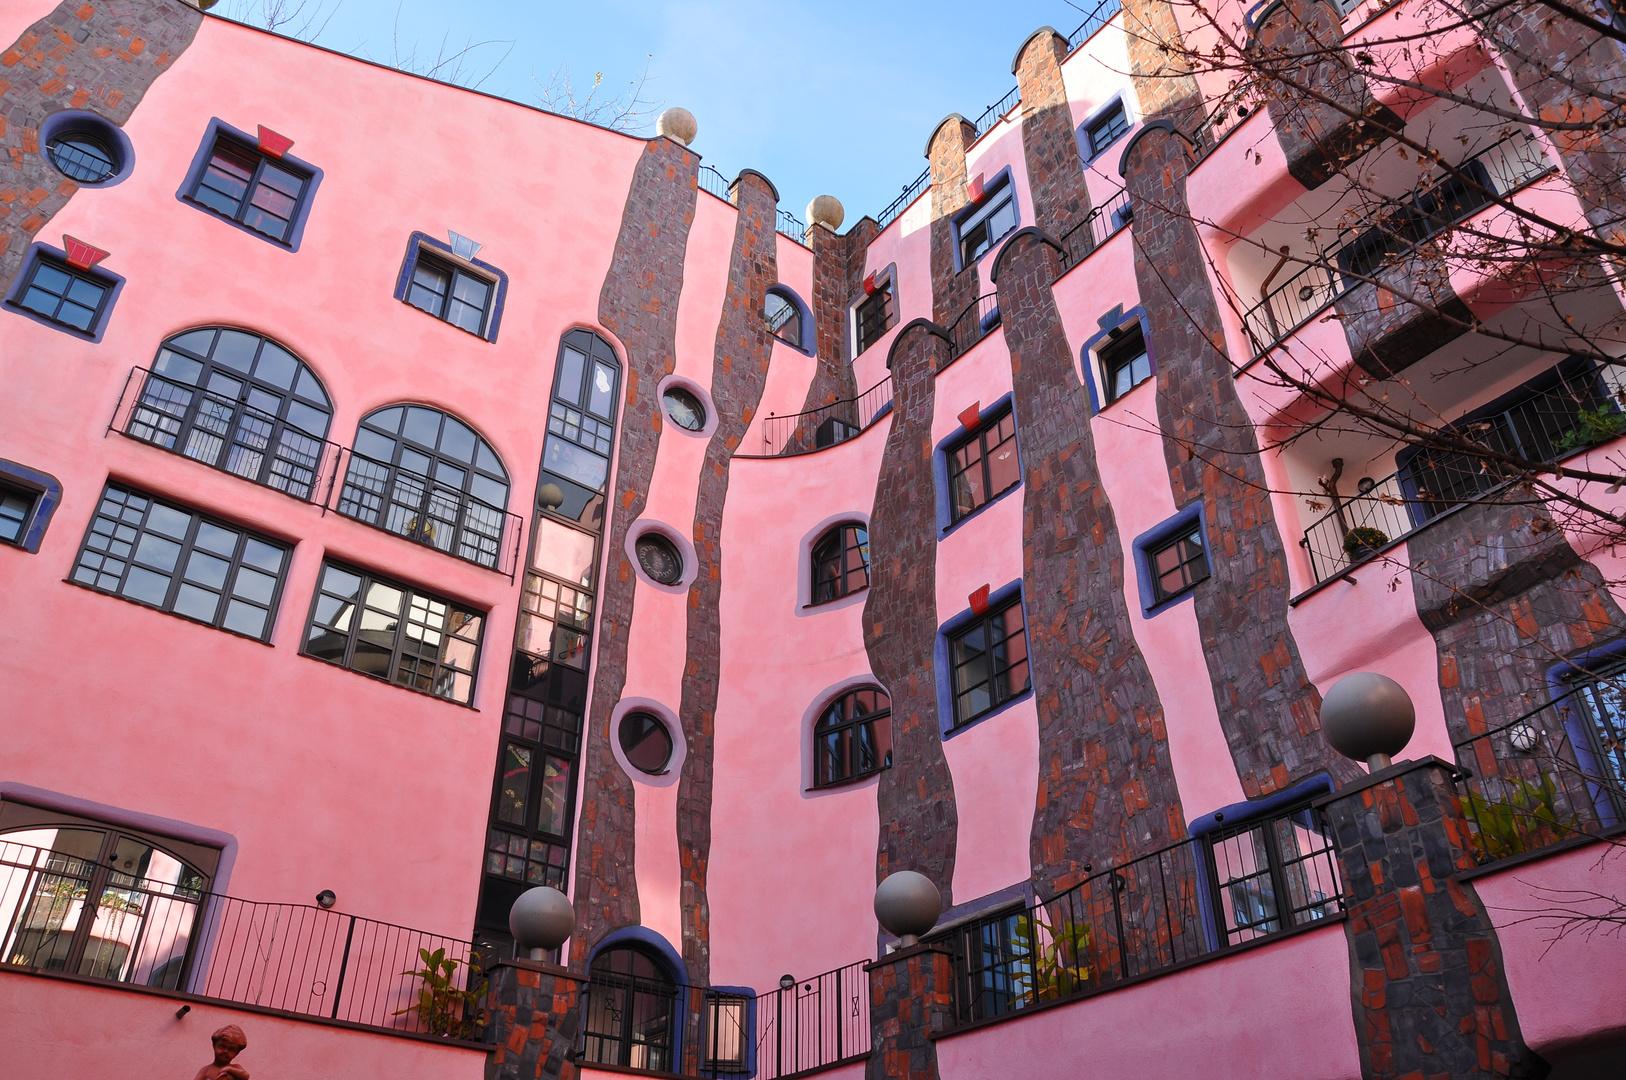 Hundertwasserhaus in Magdeburg